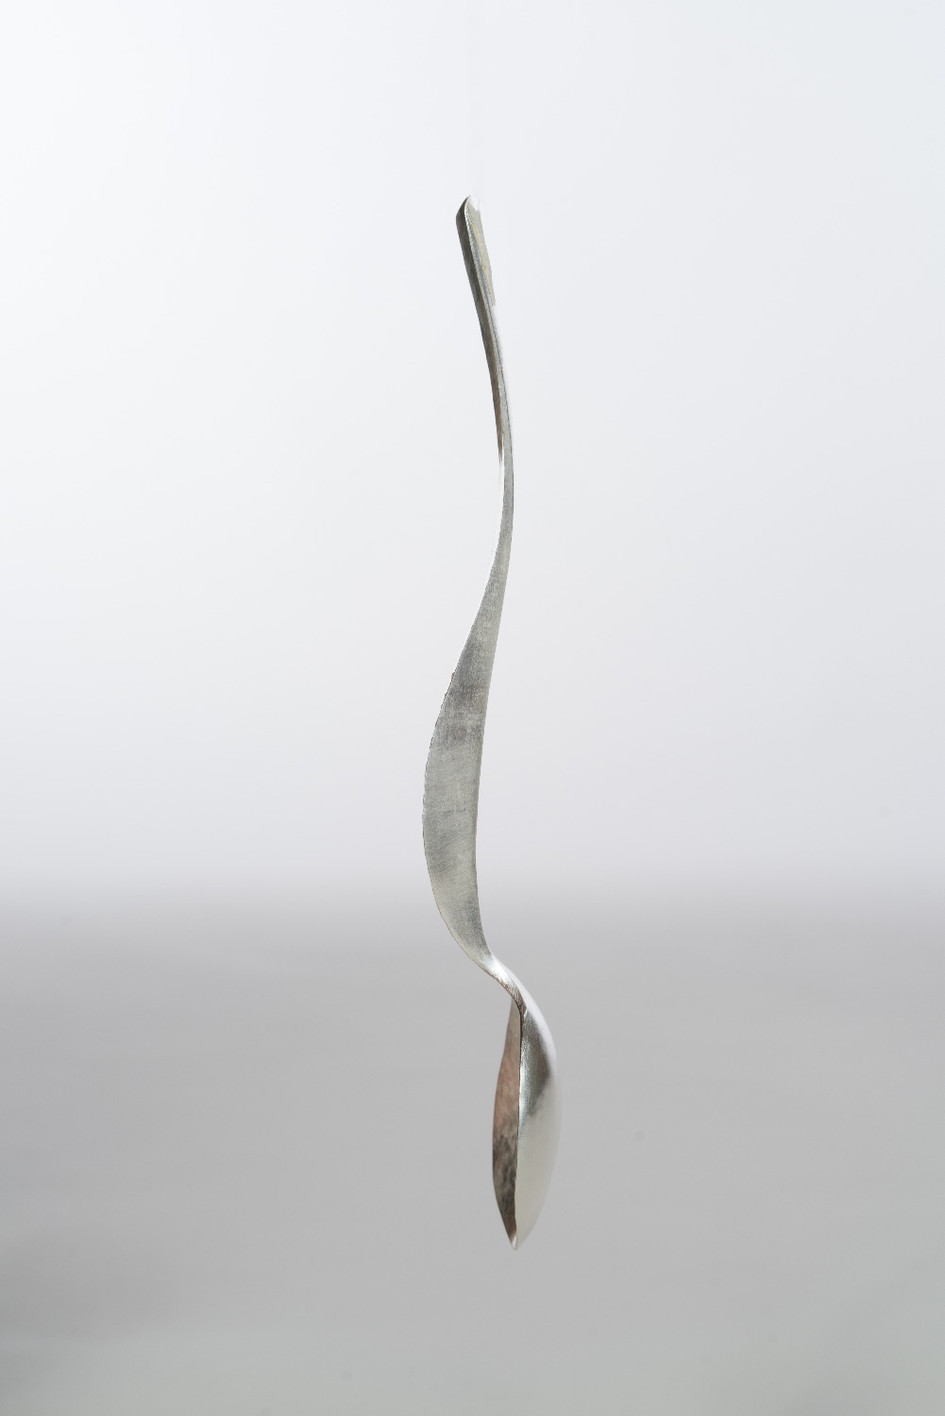 Ingot Forged Spoon